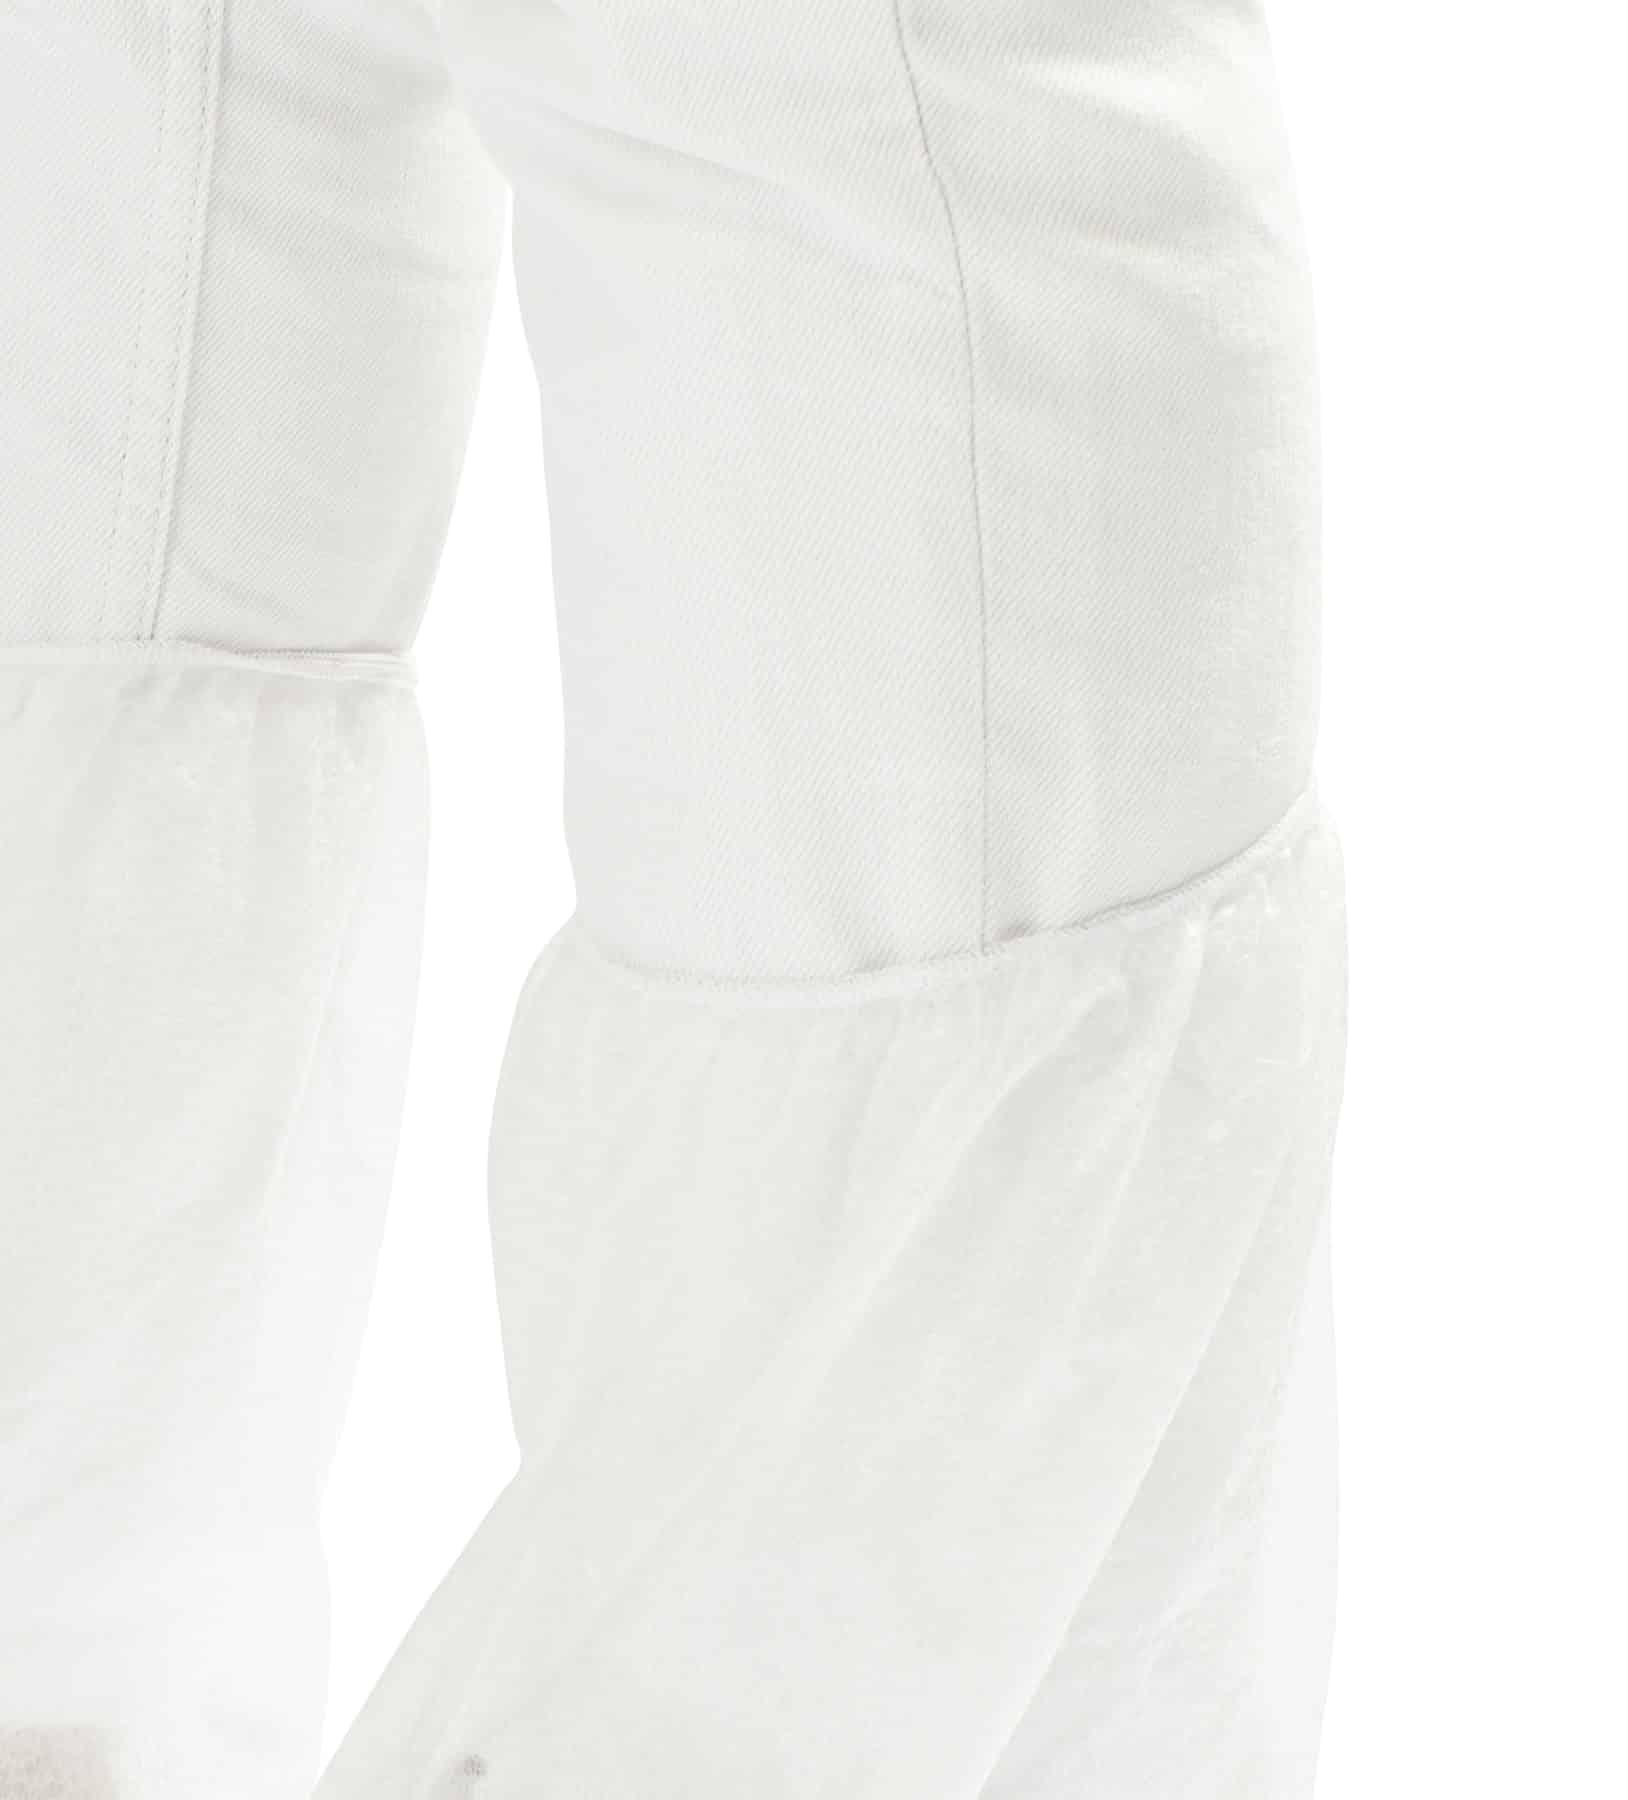 cobre botas 3 - boot-covers - clothe protect